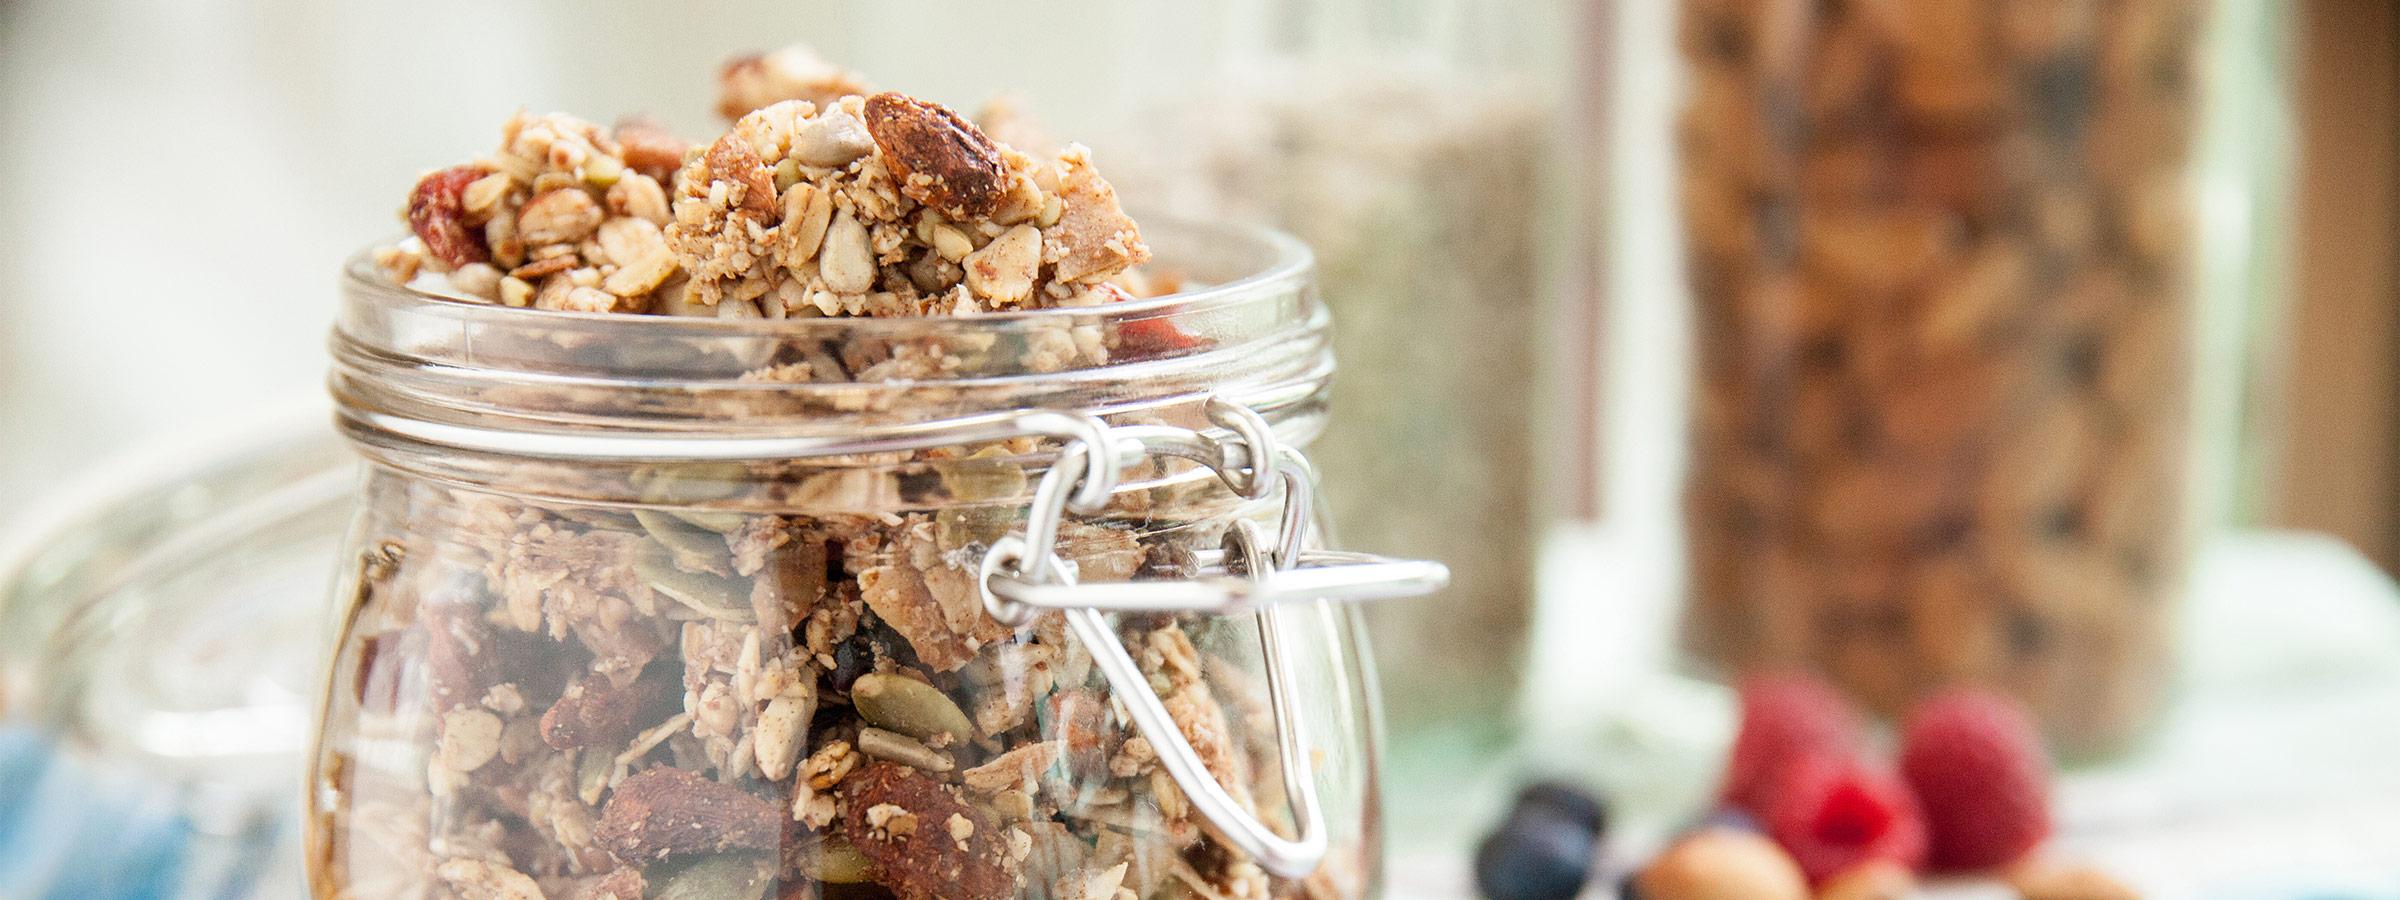 cranberry & nut granola main image